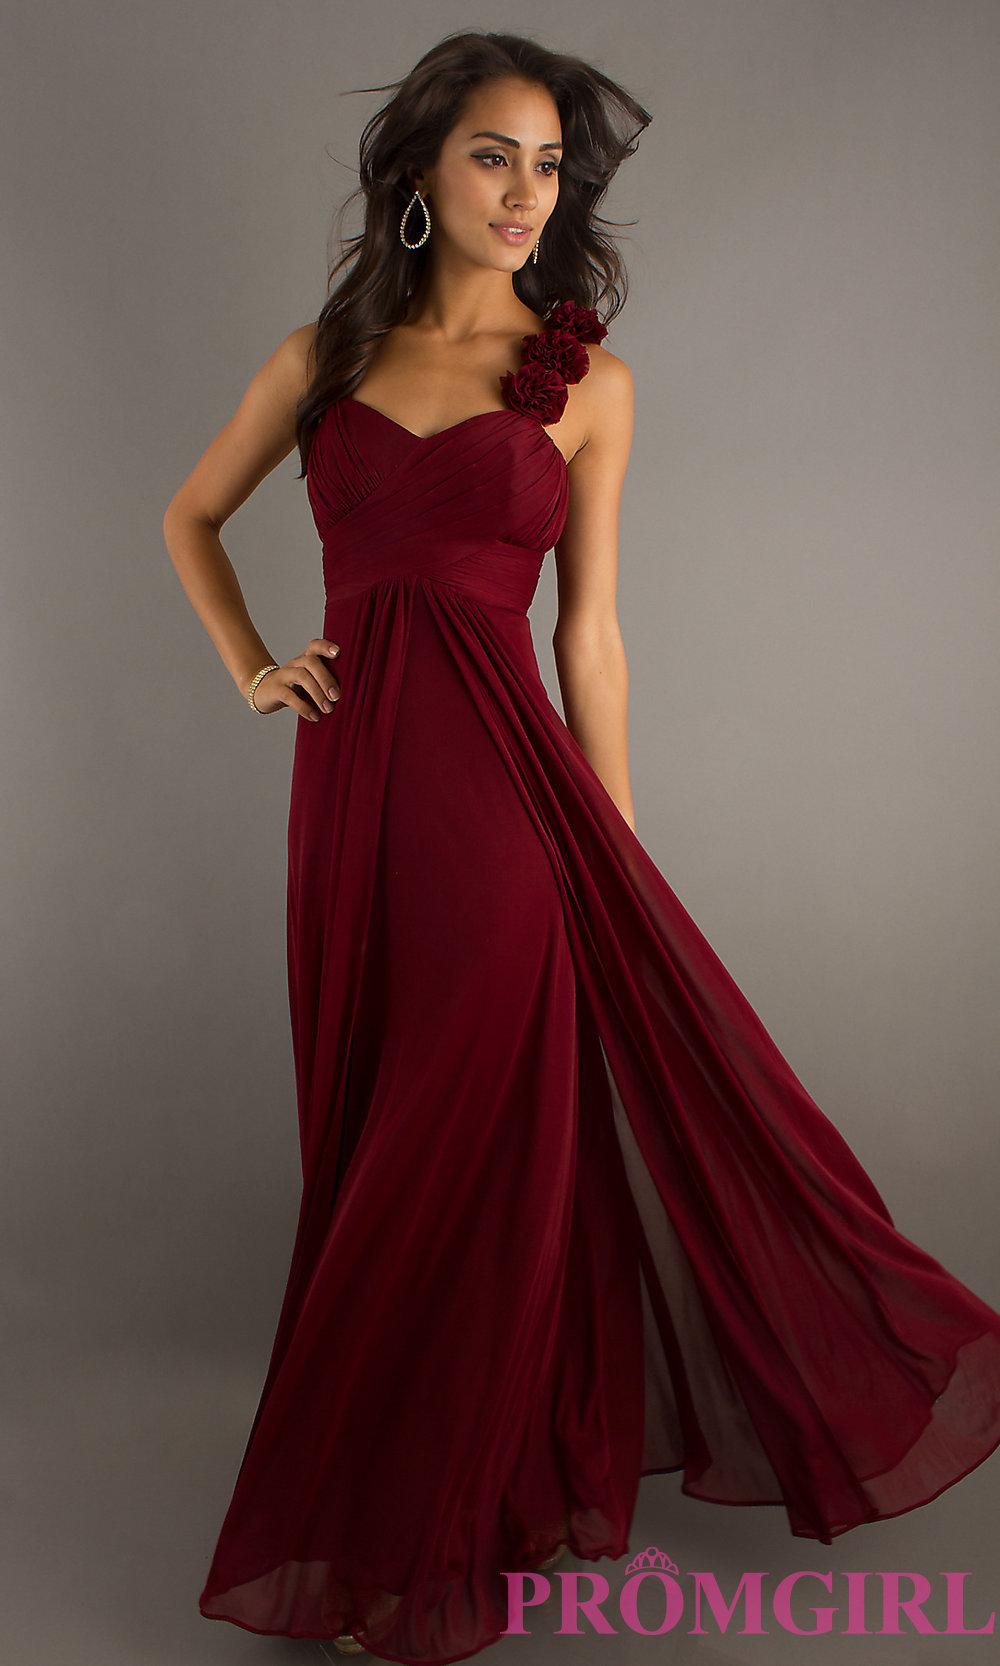 Long Dress Length - Elegant And Beautiful - Dresses Ask